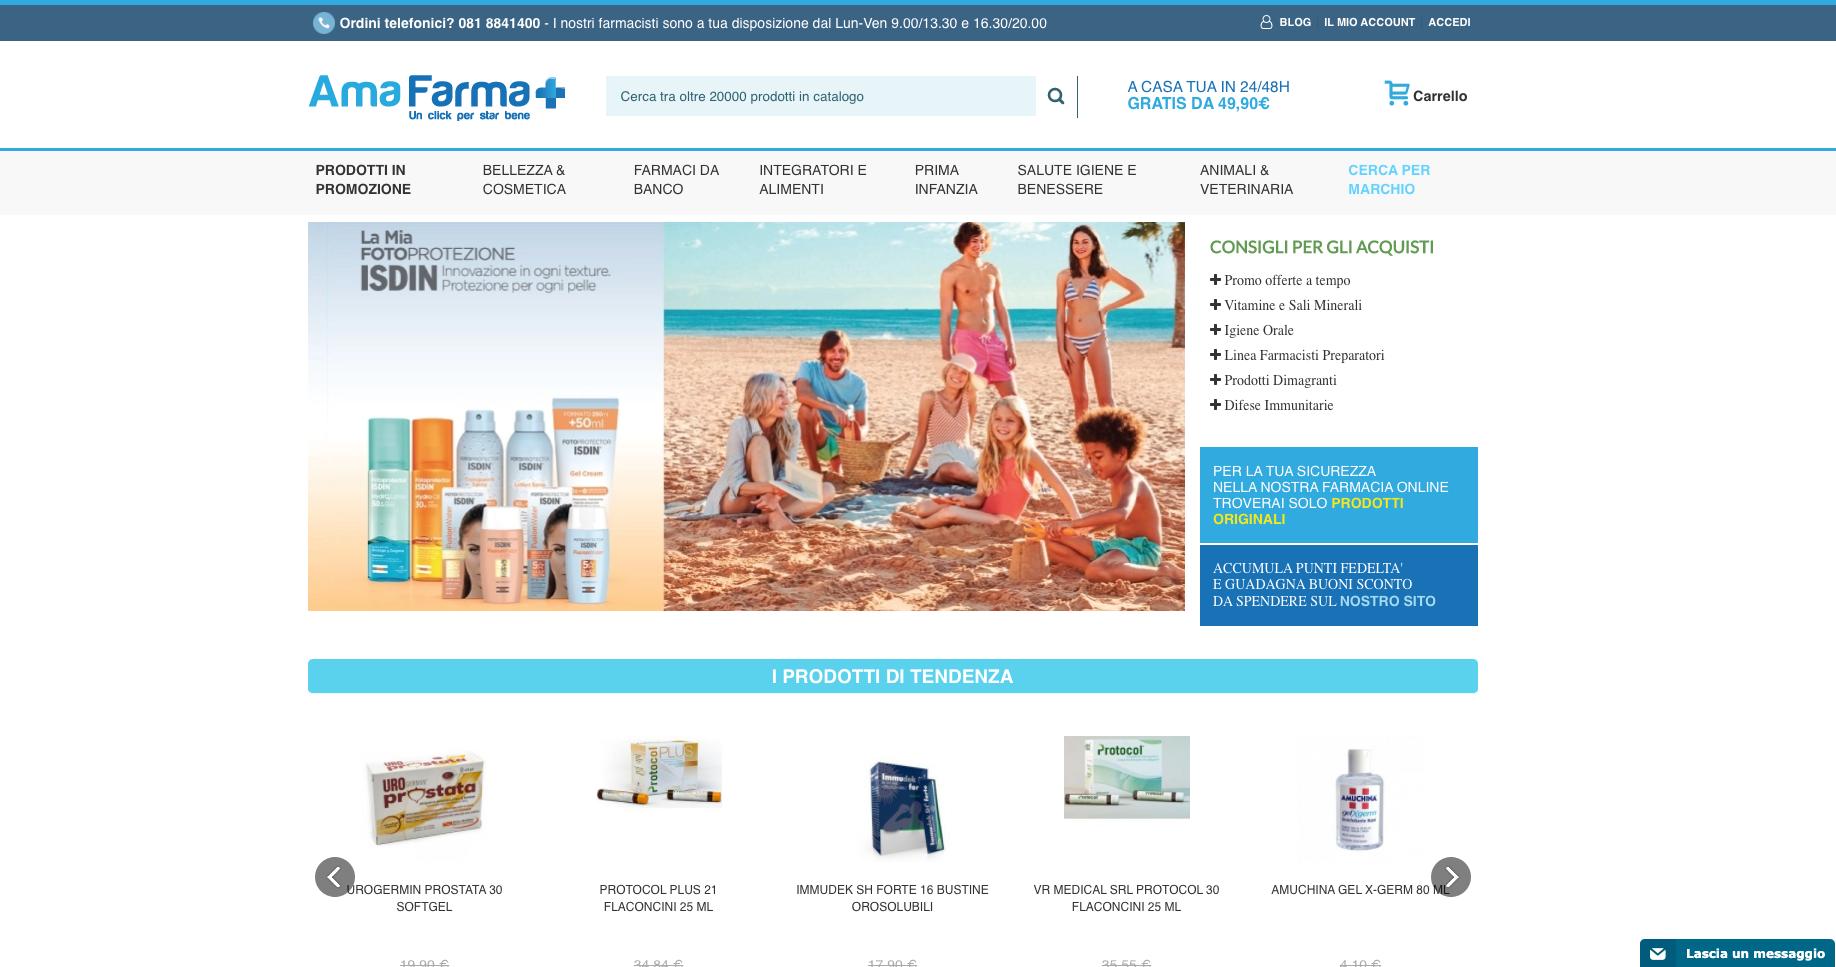 Amafarma Farmacia online